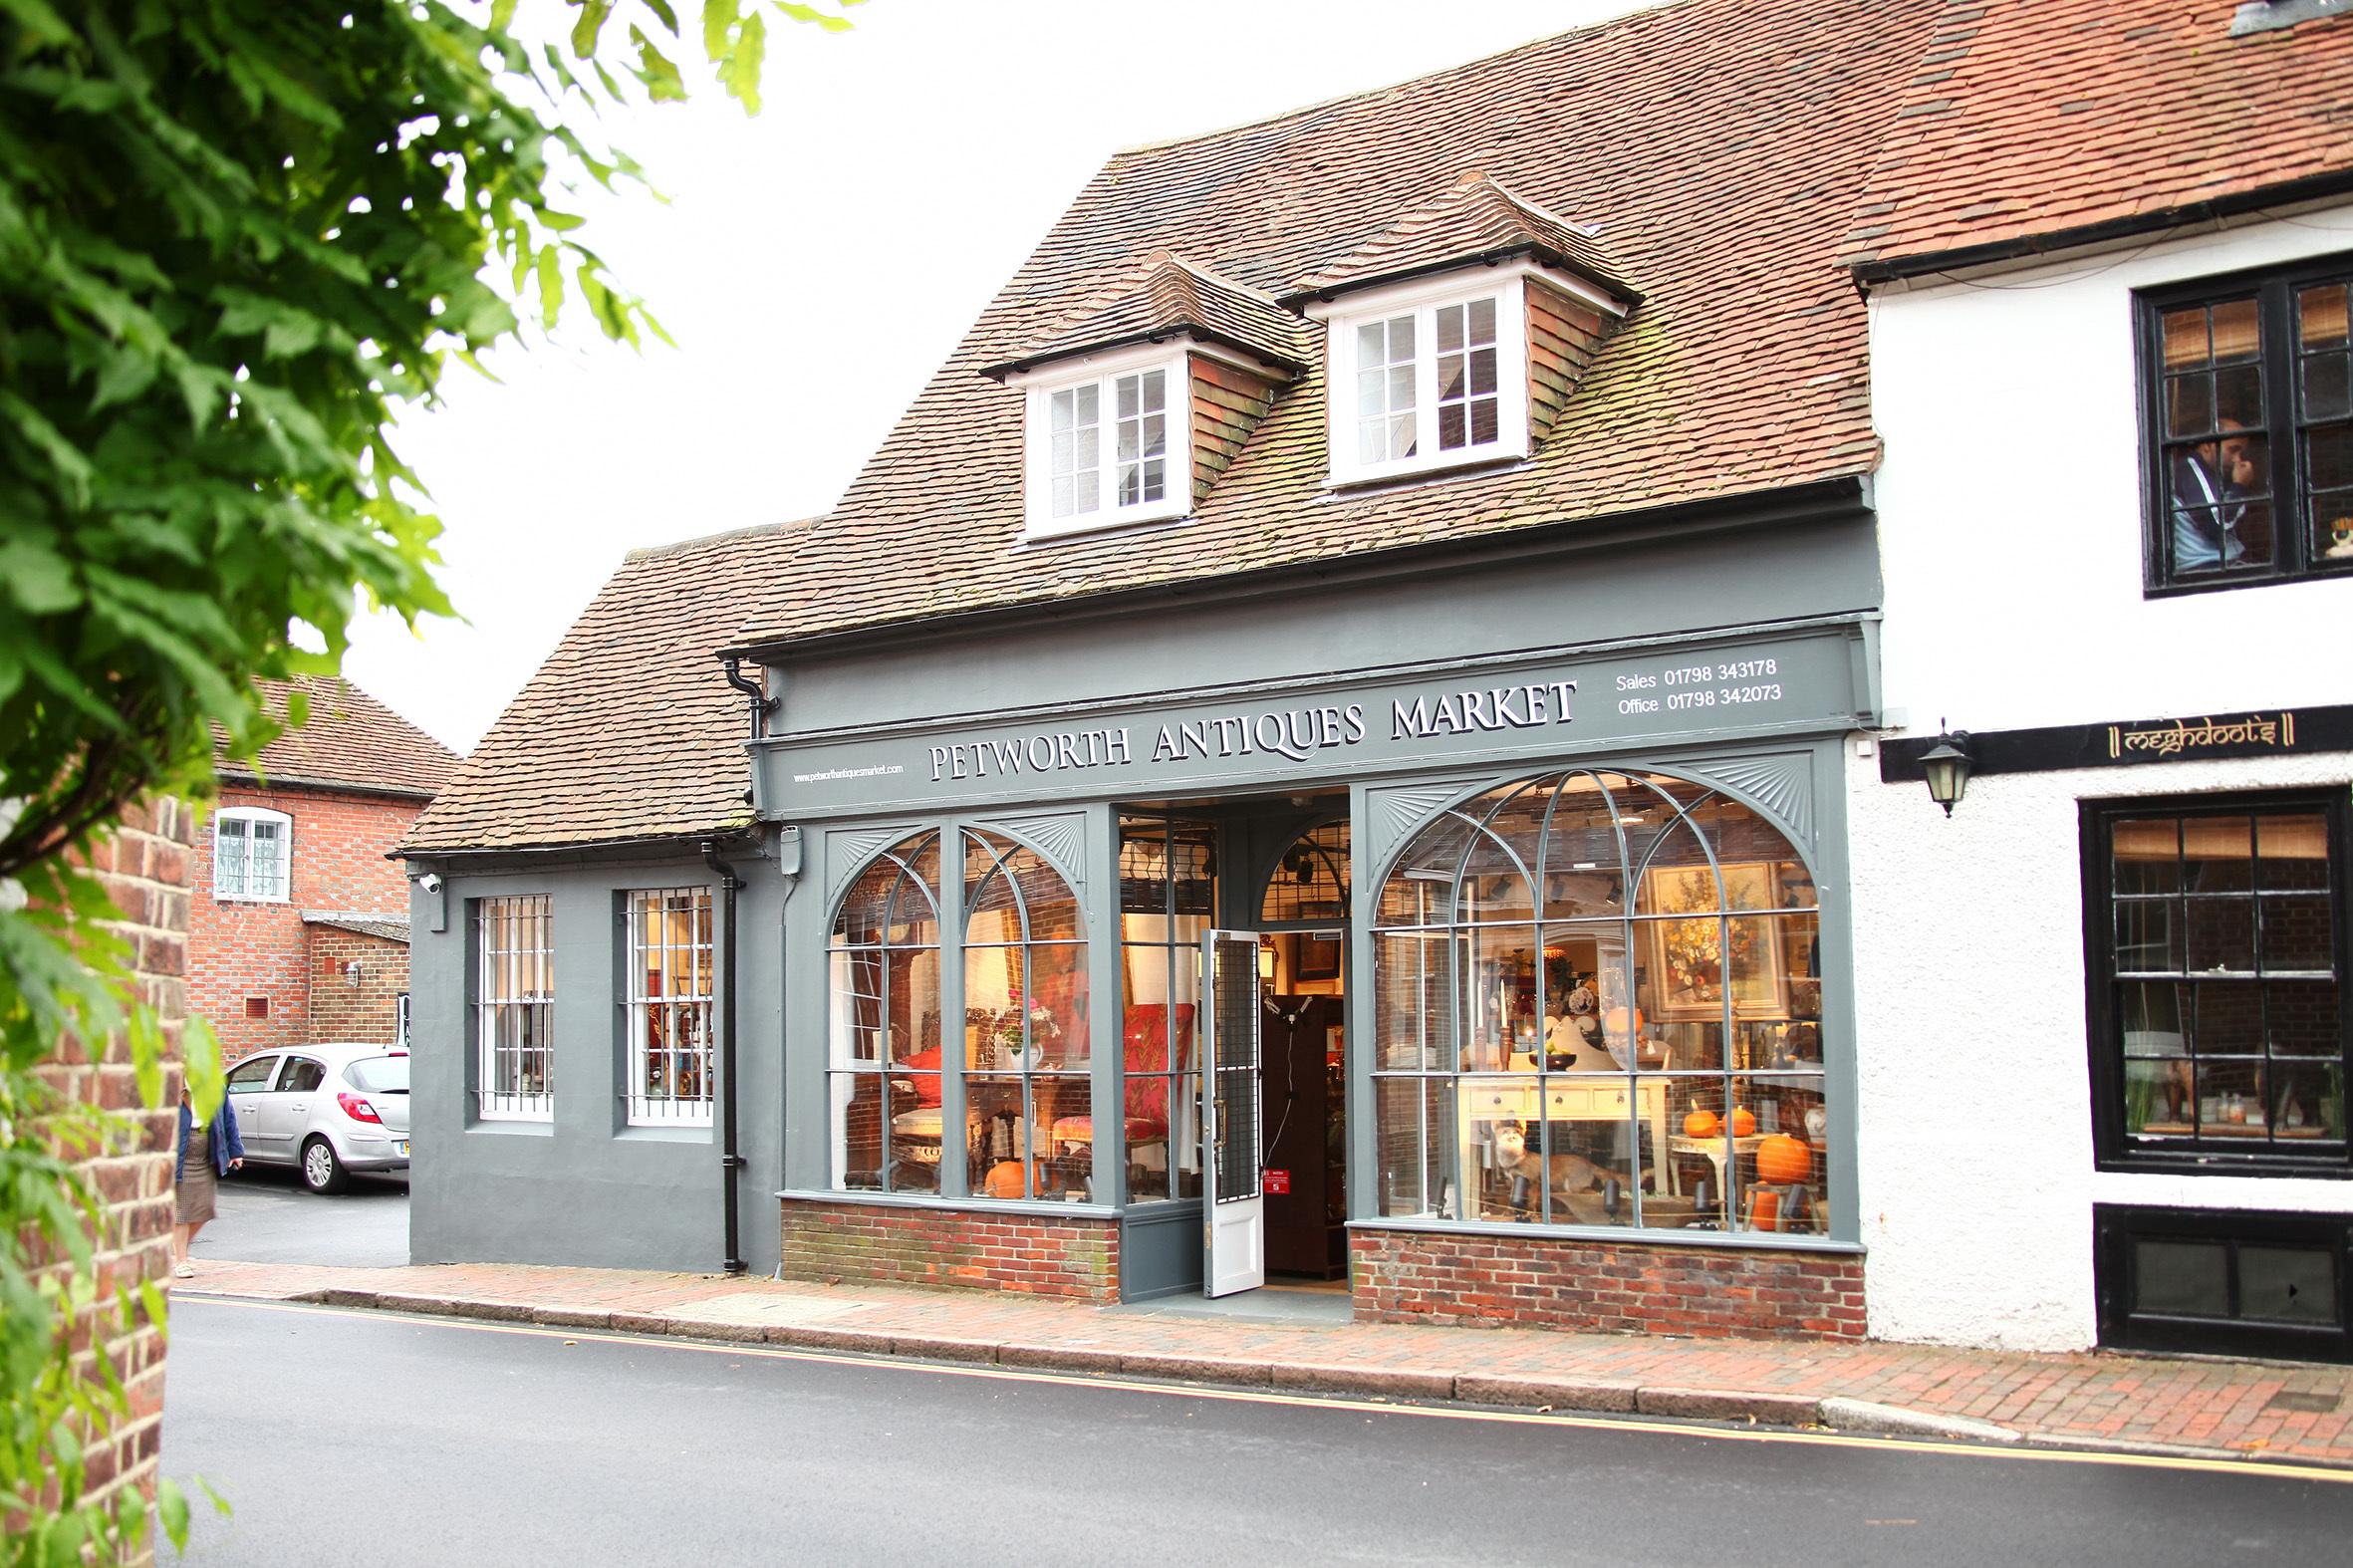 Petworth Antiques Centre